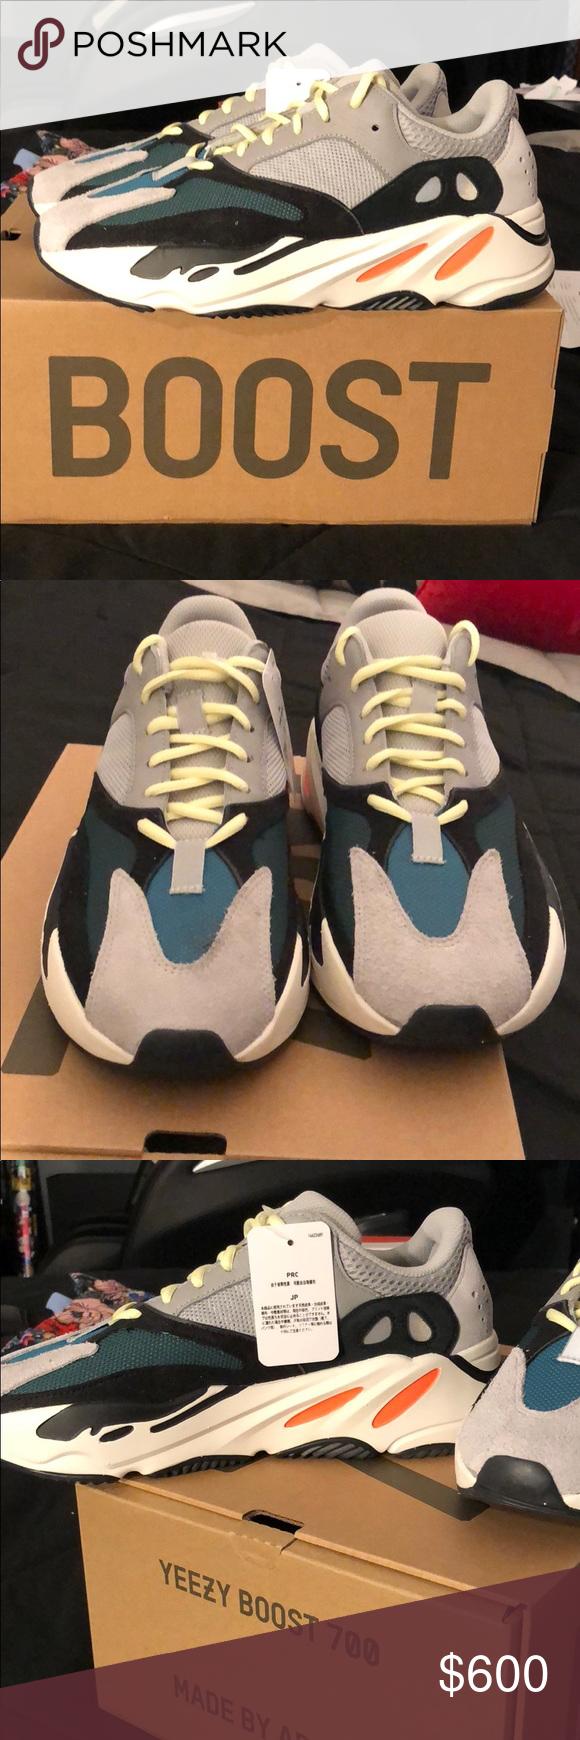 Yeezy ondata runner 700 nwt pinterest yeezy, adidas e scarpe adidas